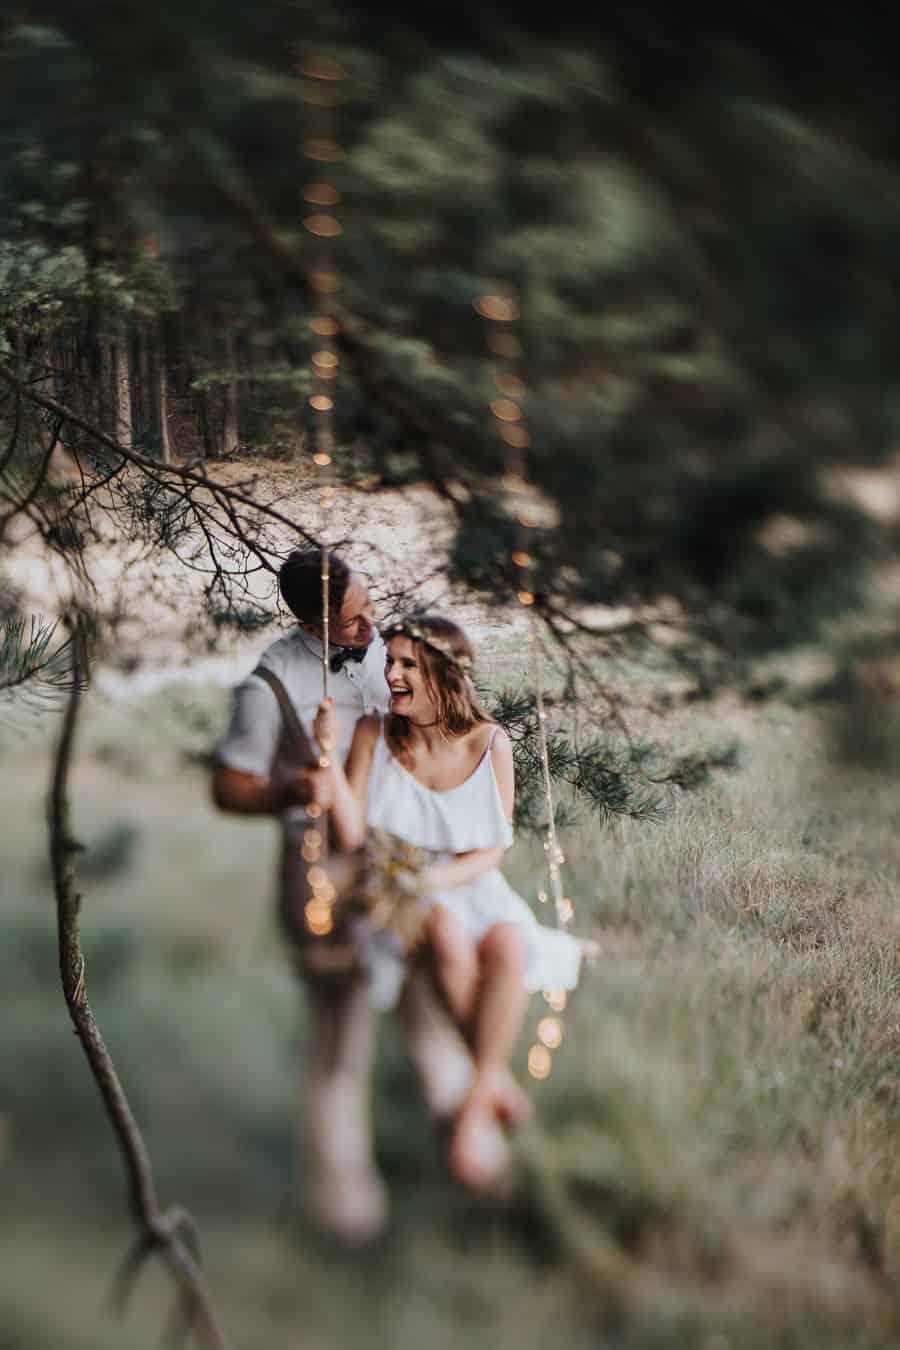 Rustykalna sesja narzeczeńska w lesie, sesja na huśtawce, tilt shift